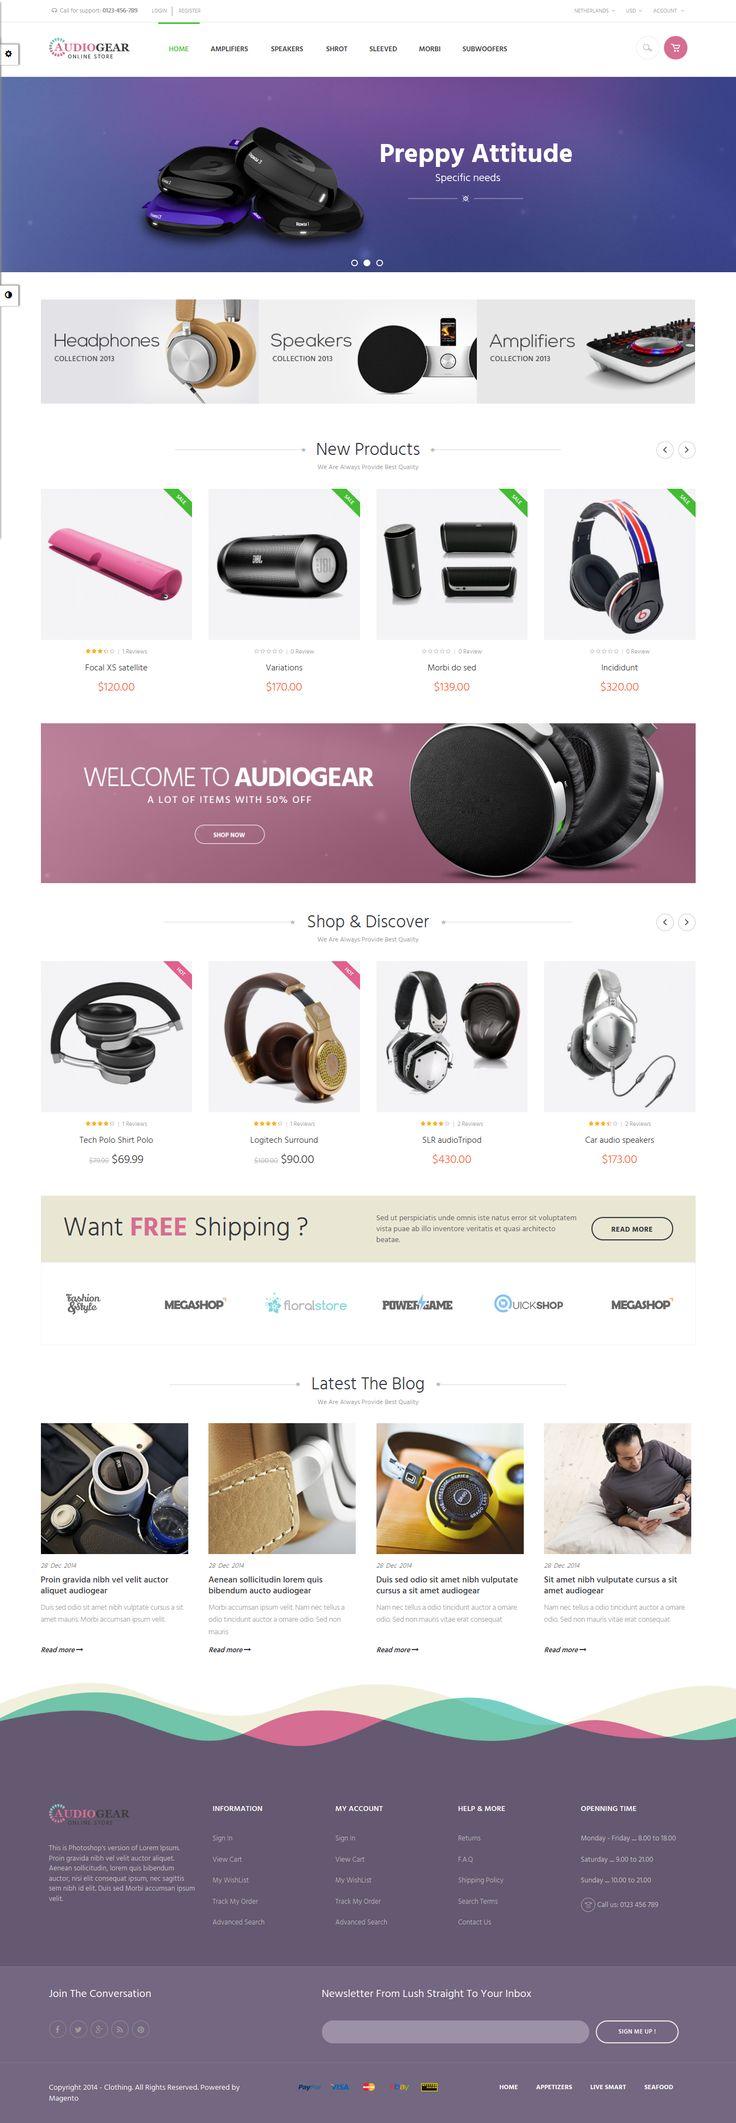 New beautiful responsive Magento theme 2015 #audio #electronics #store